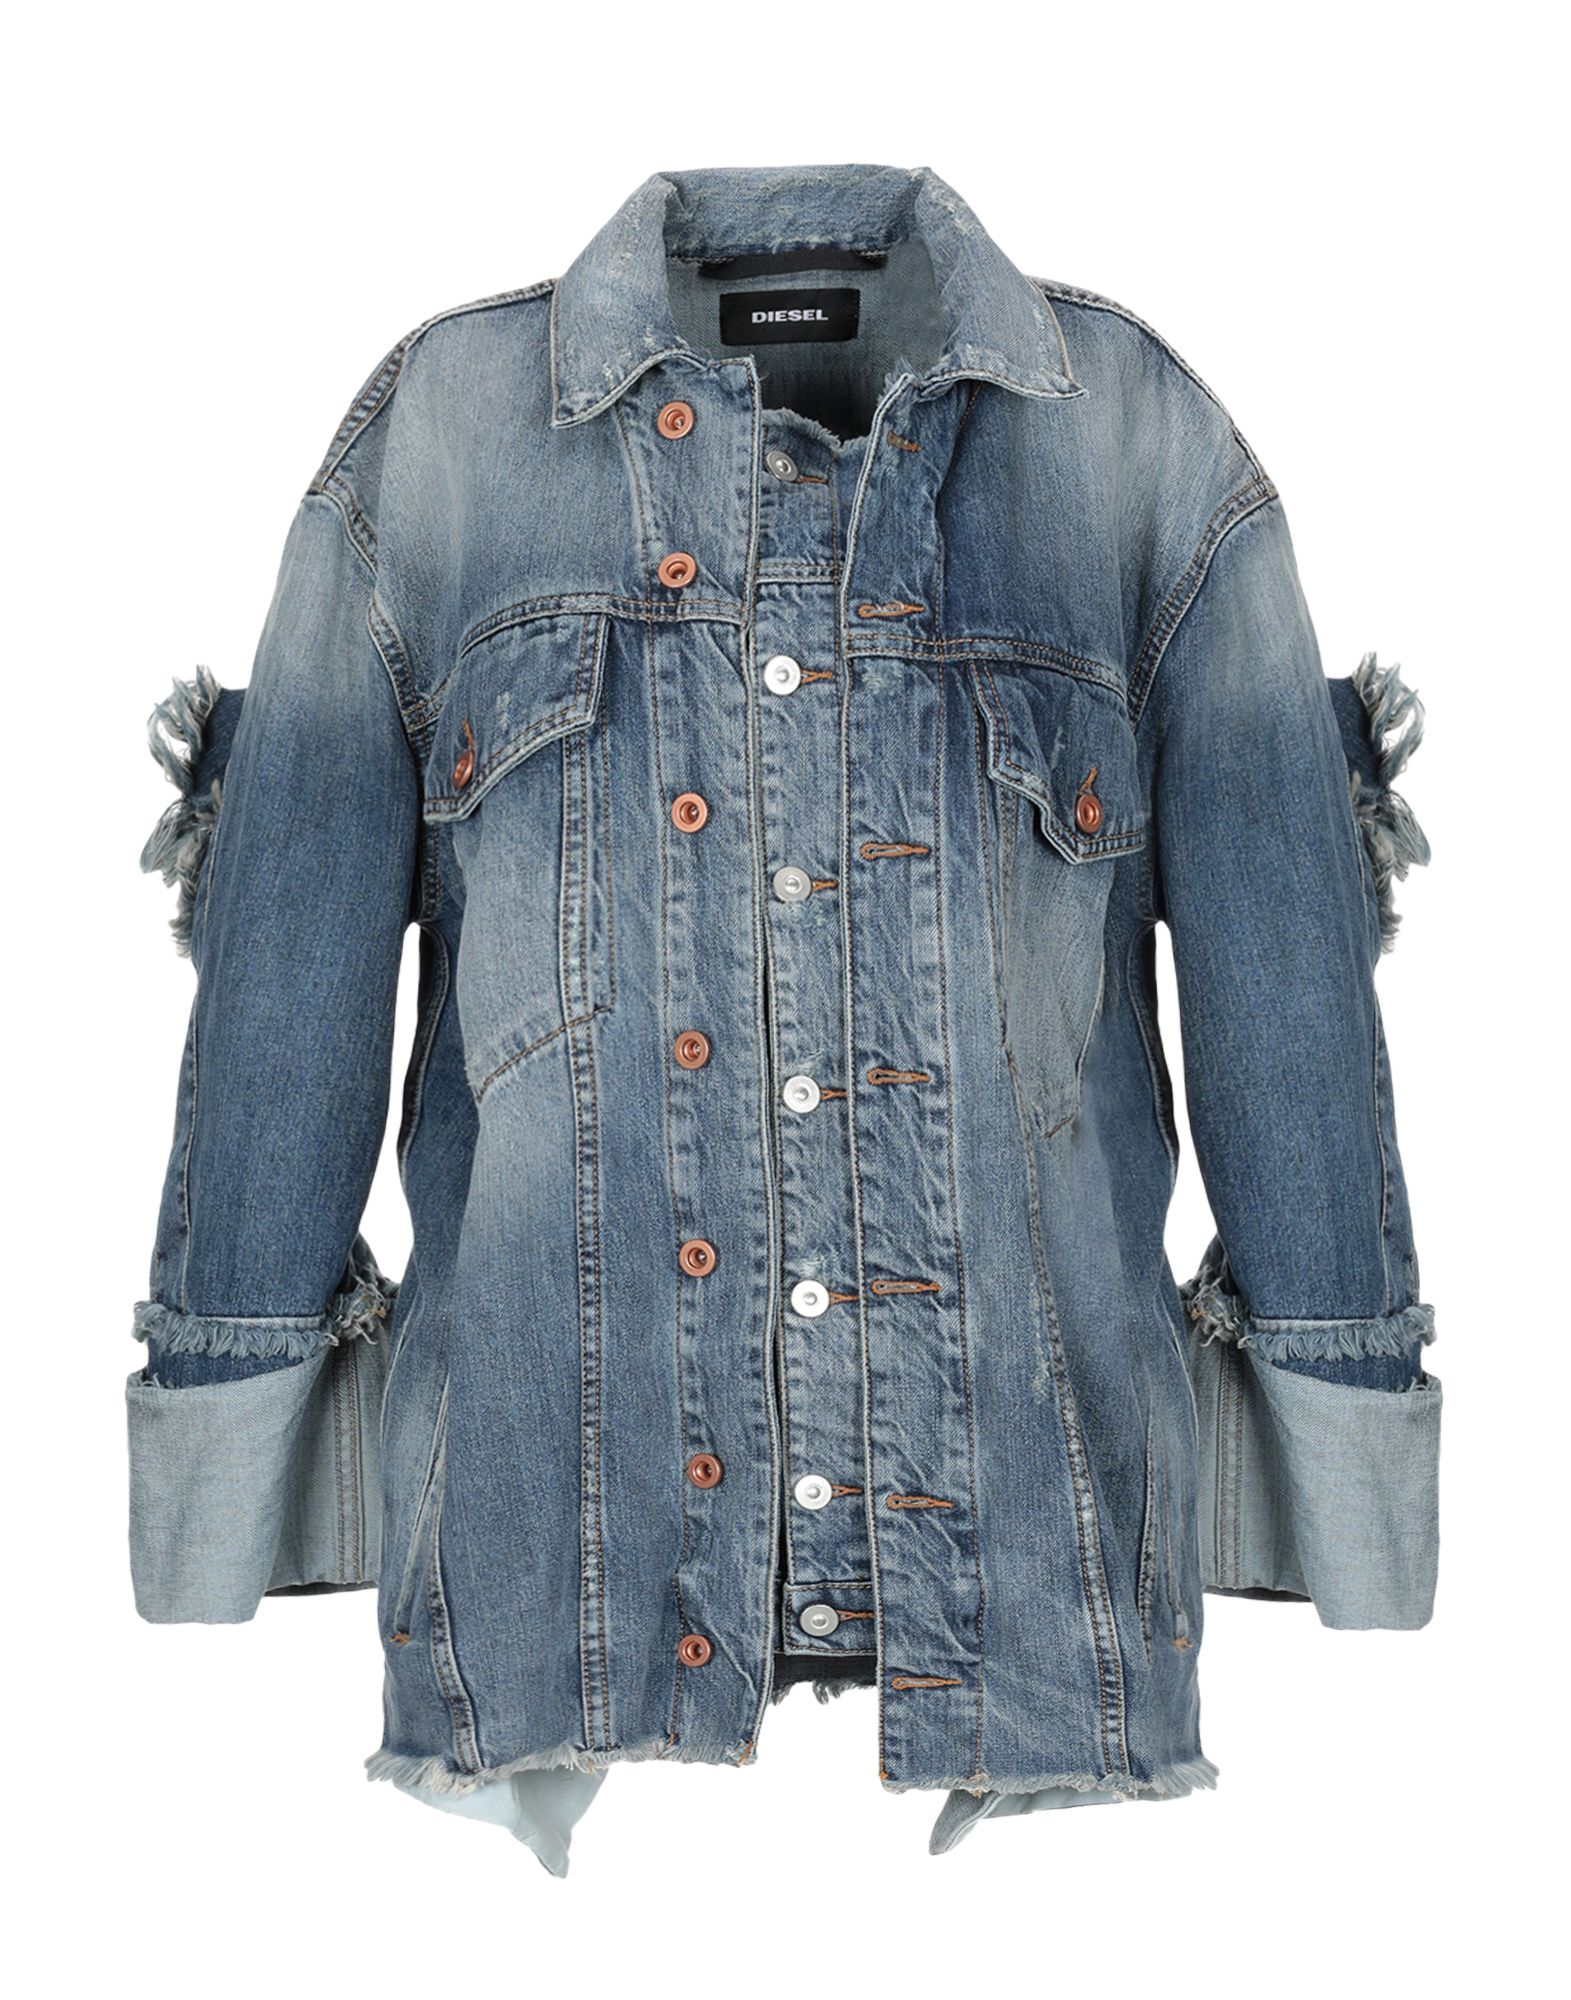 цена на DIESEL Джинсовая верхняя одежда